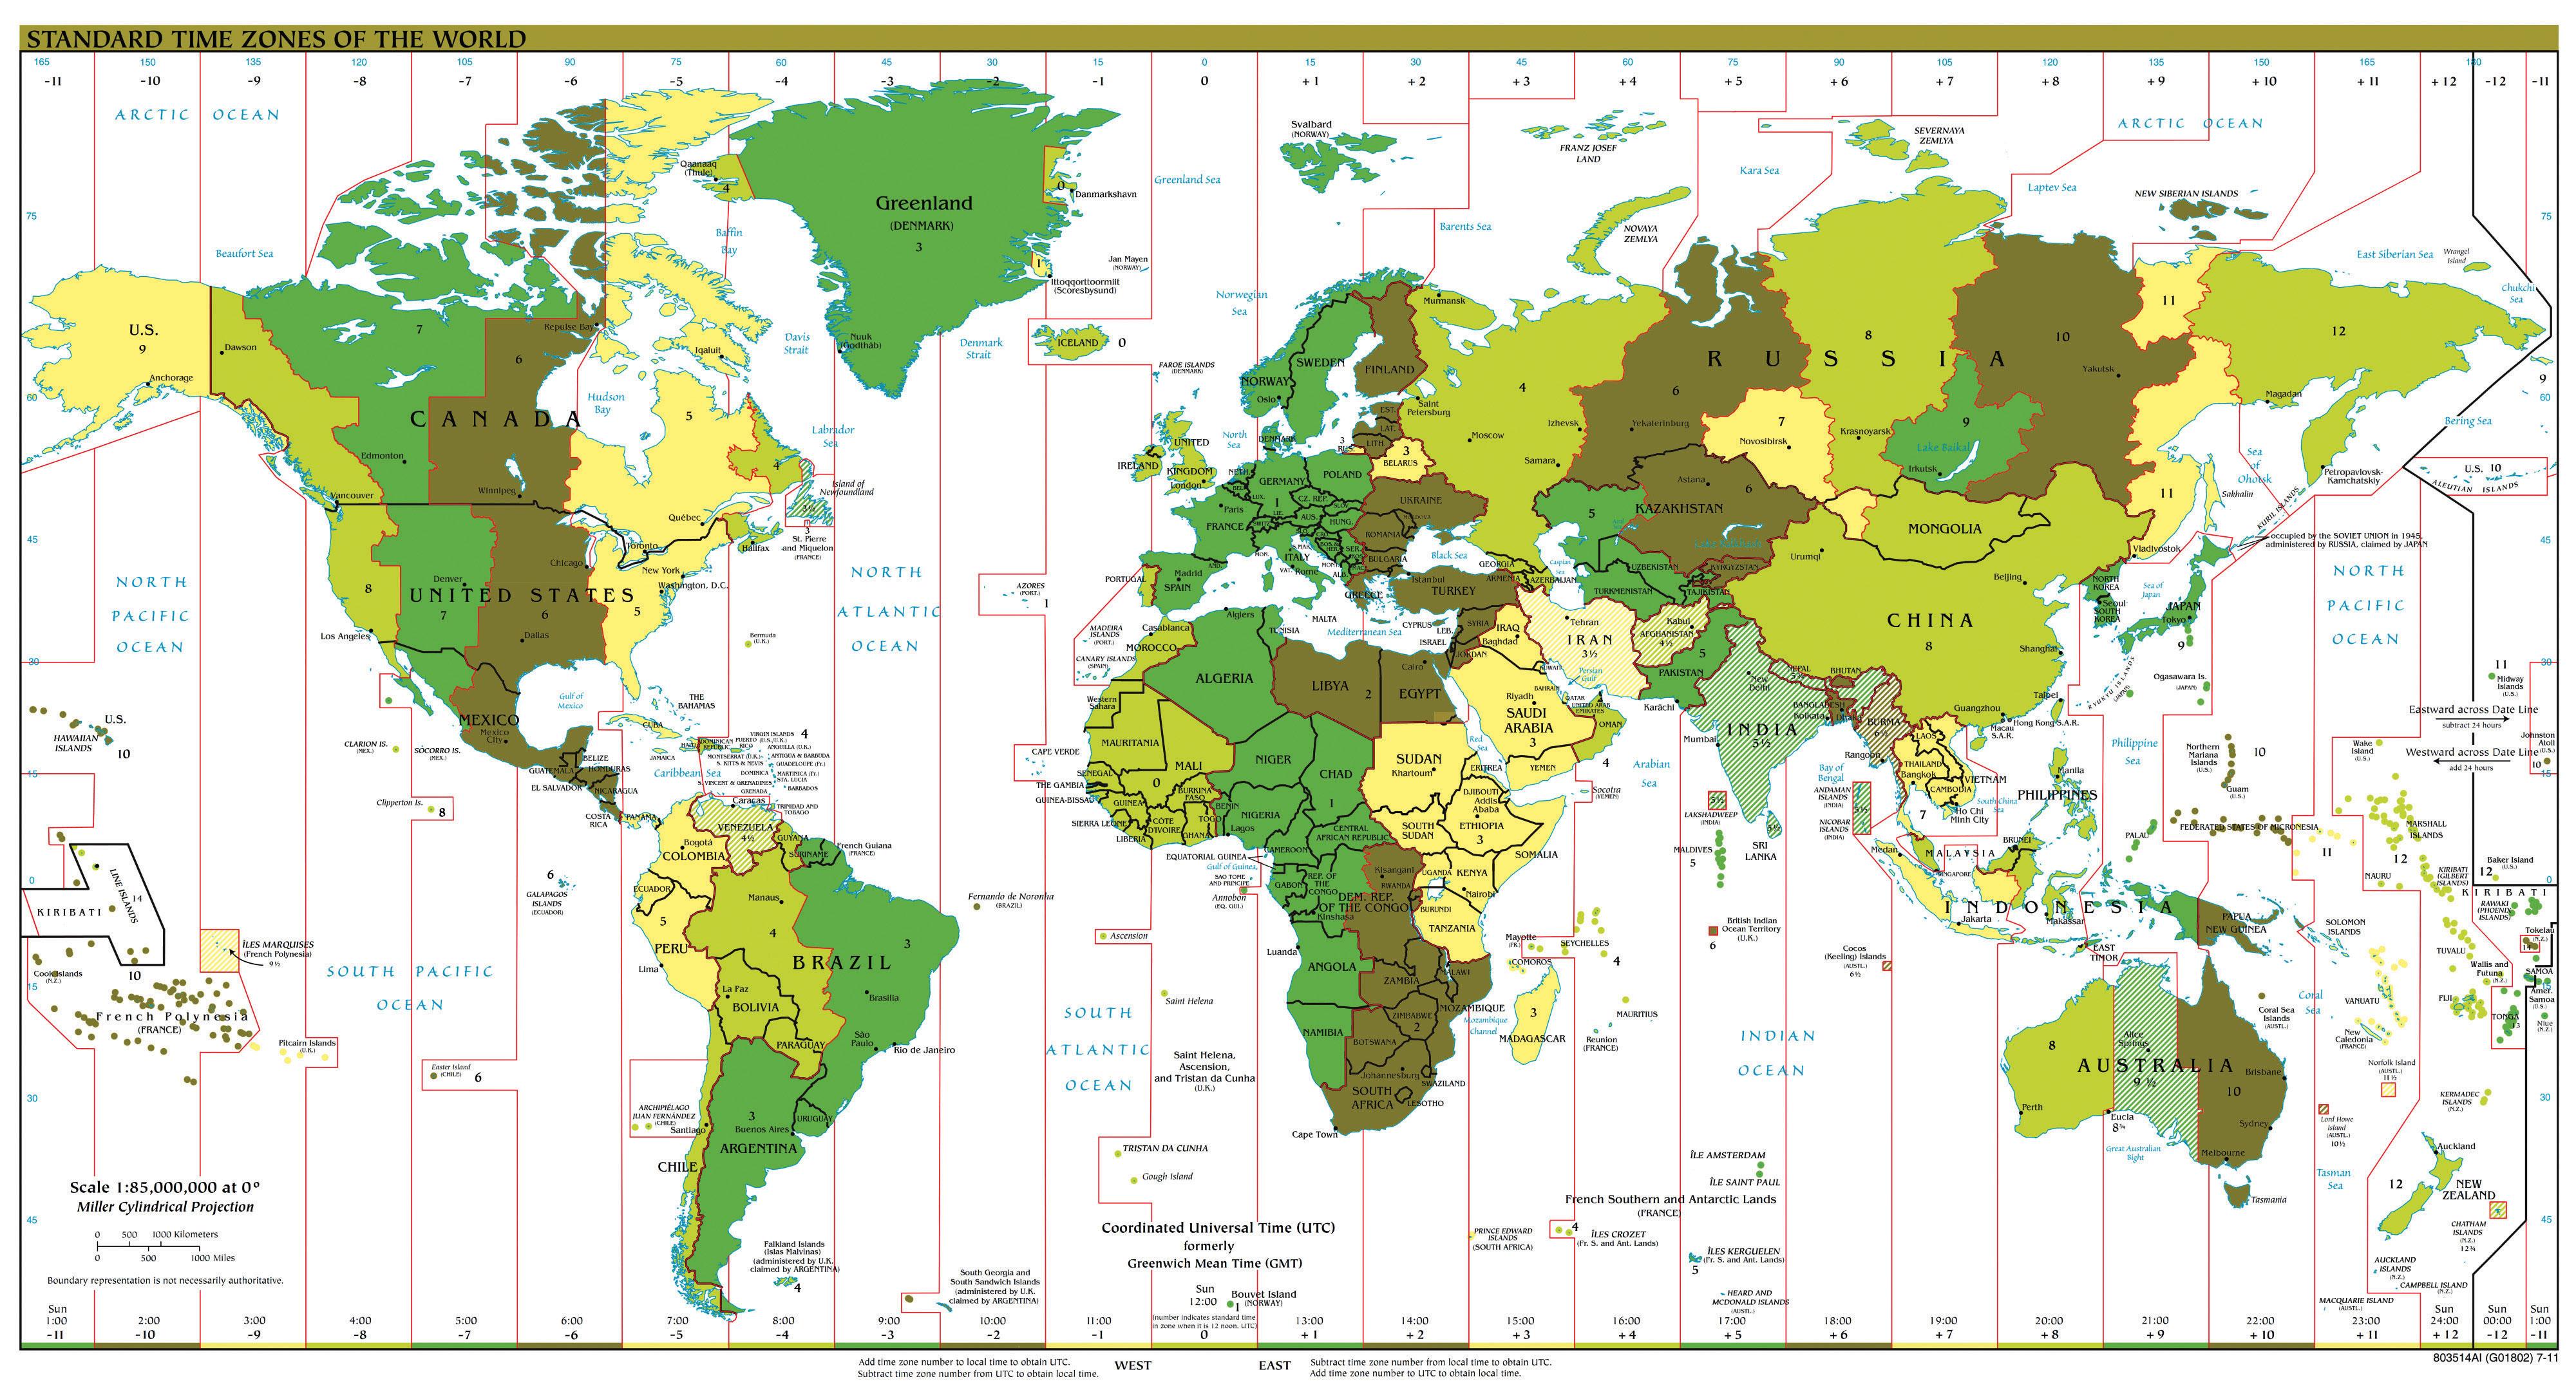 Teaching equator and prime meridian